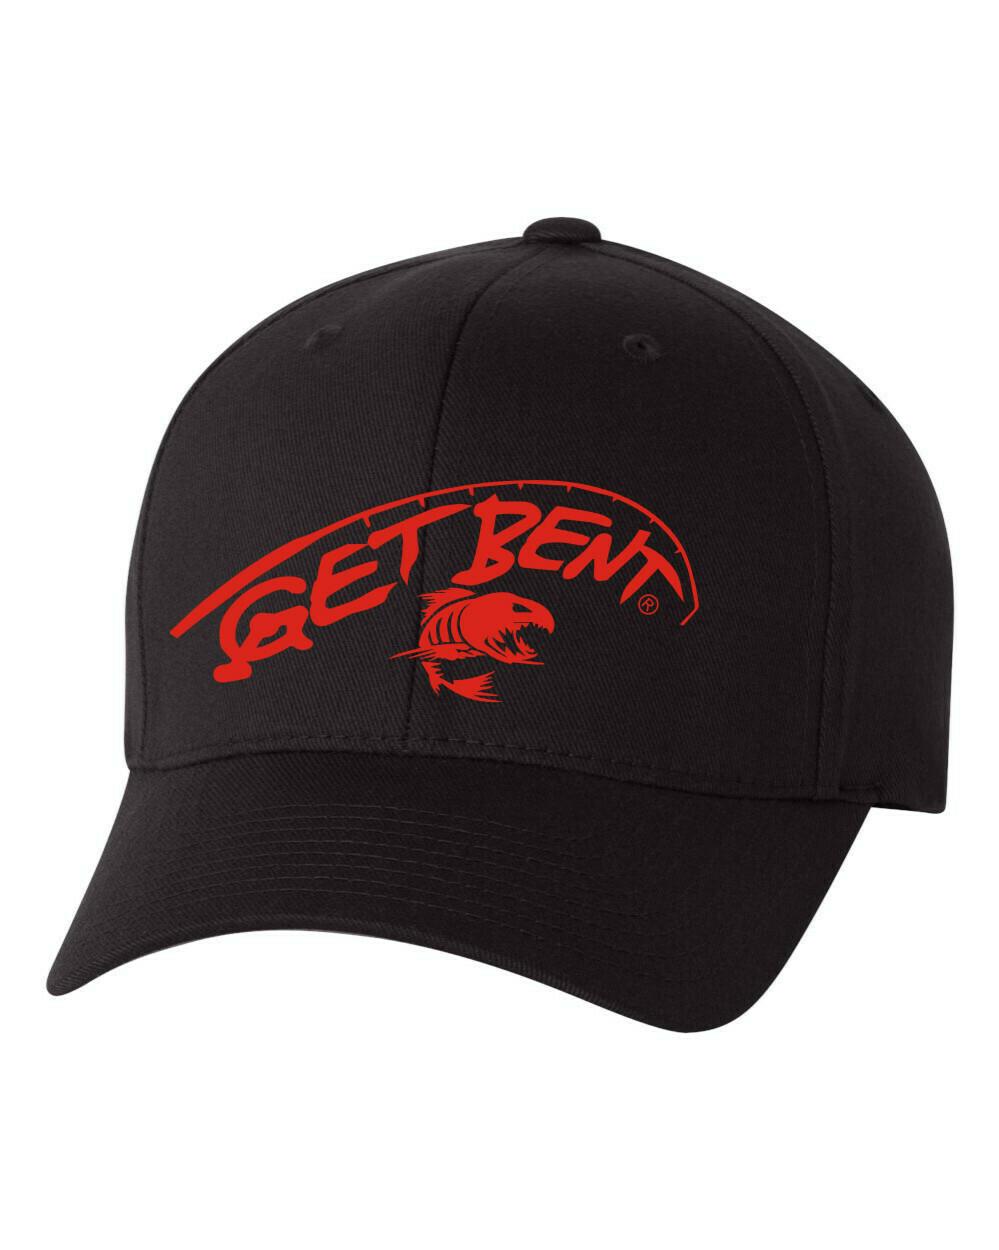 'Get Bent' - Flex Fit Hat - Black